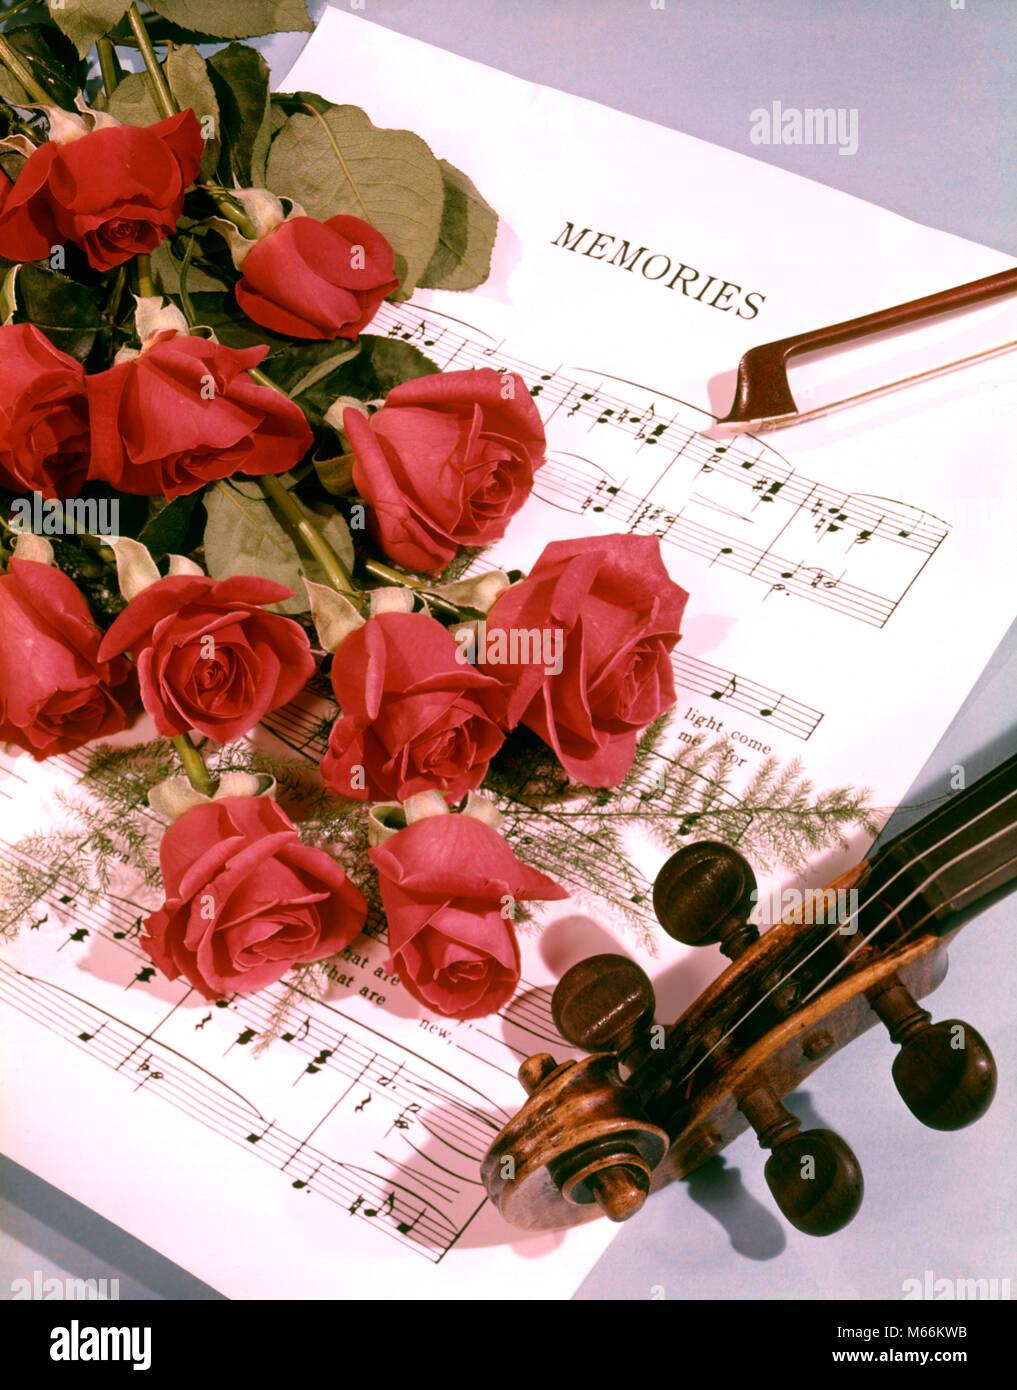 Violin Flowers Stock Photos & Violin Flowers Stock Images - Alamy